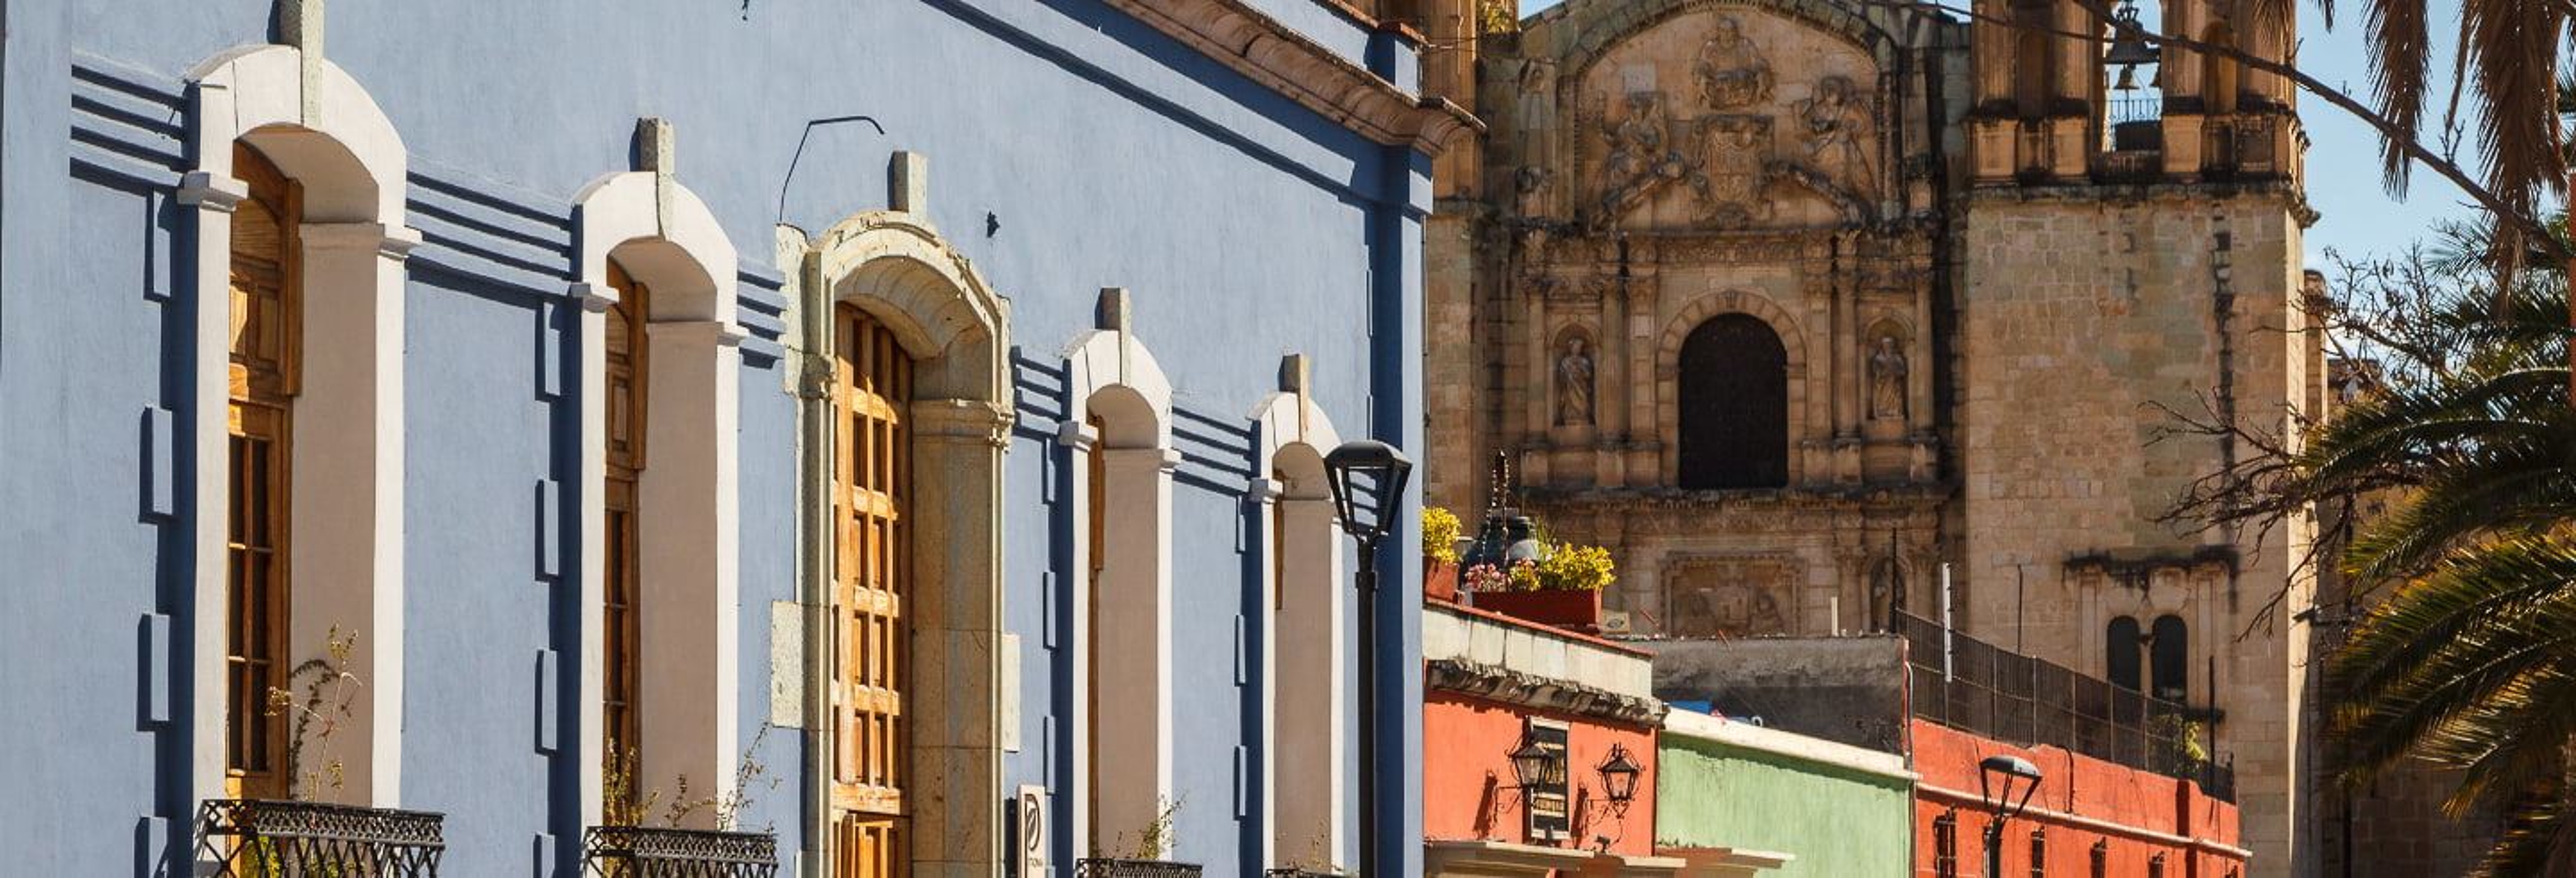 Visita guiada por Oaxaca